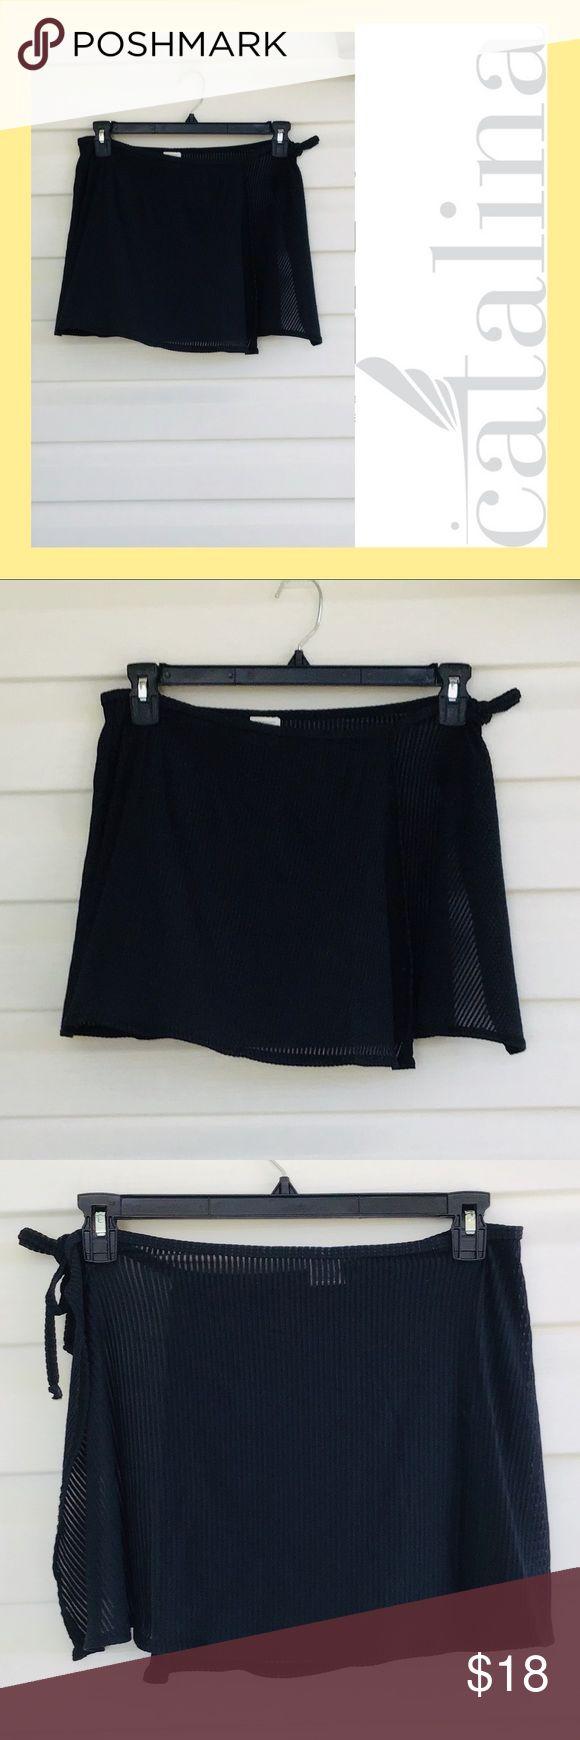 Catalina sarong black L Catalina sarong Size large  Black ribbed Tie side adjust…